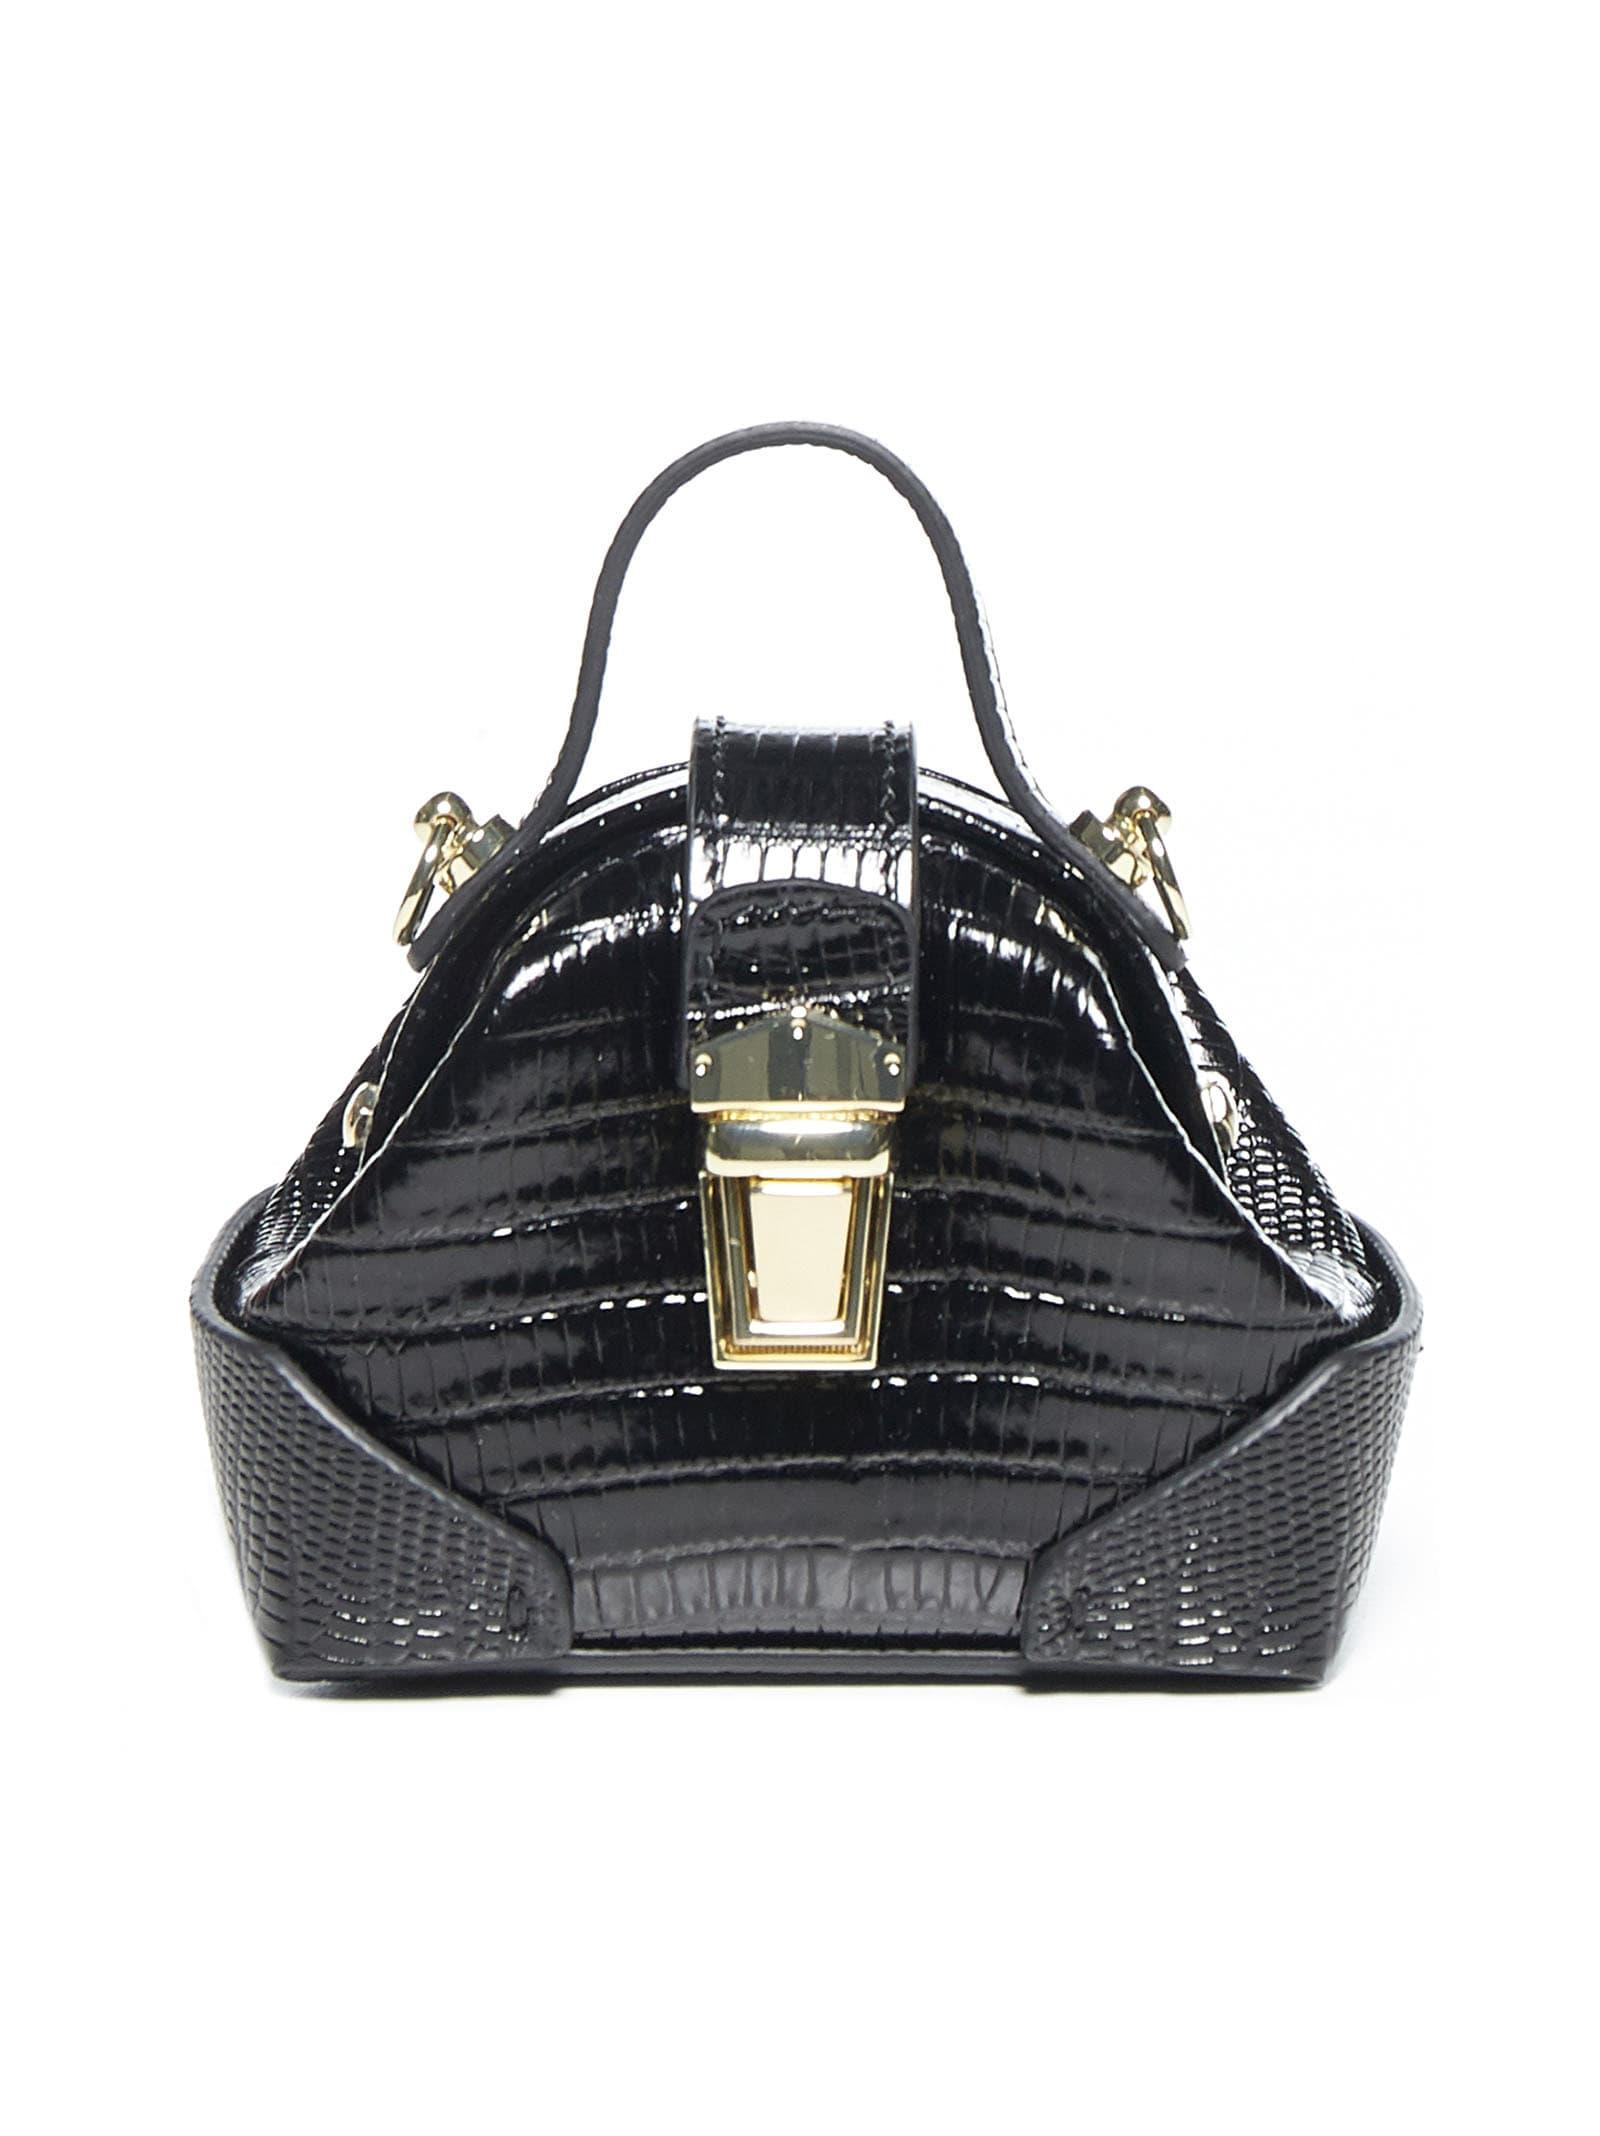 MANU Atelier Micro Demi Shoulder Bag